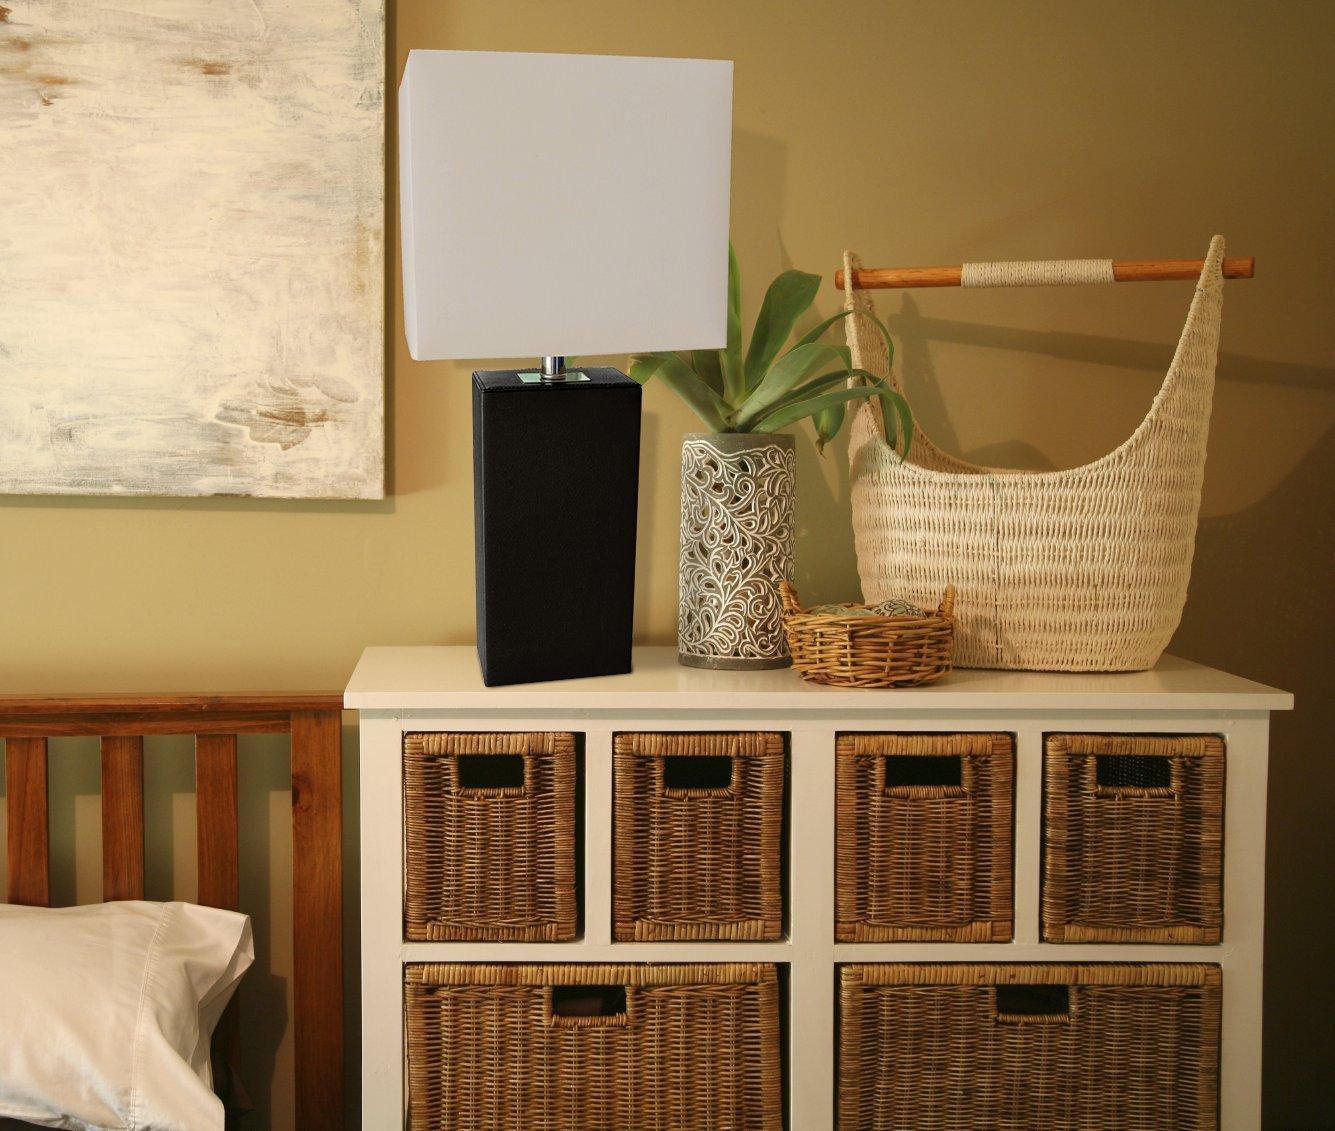 elegant designs lt1025blk modern genuine leather table lamp black amazoncom - Bedroom Table Lamps